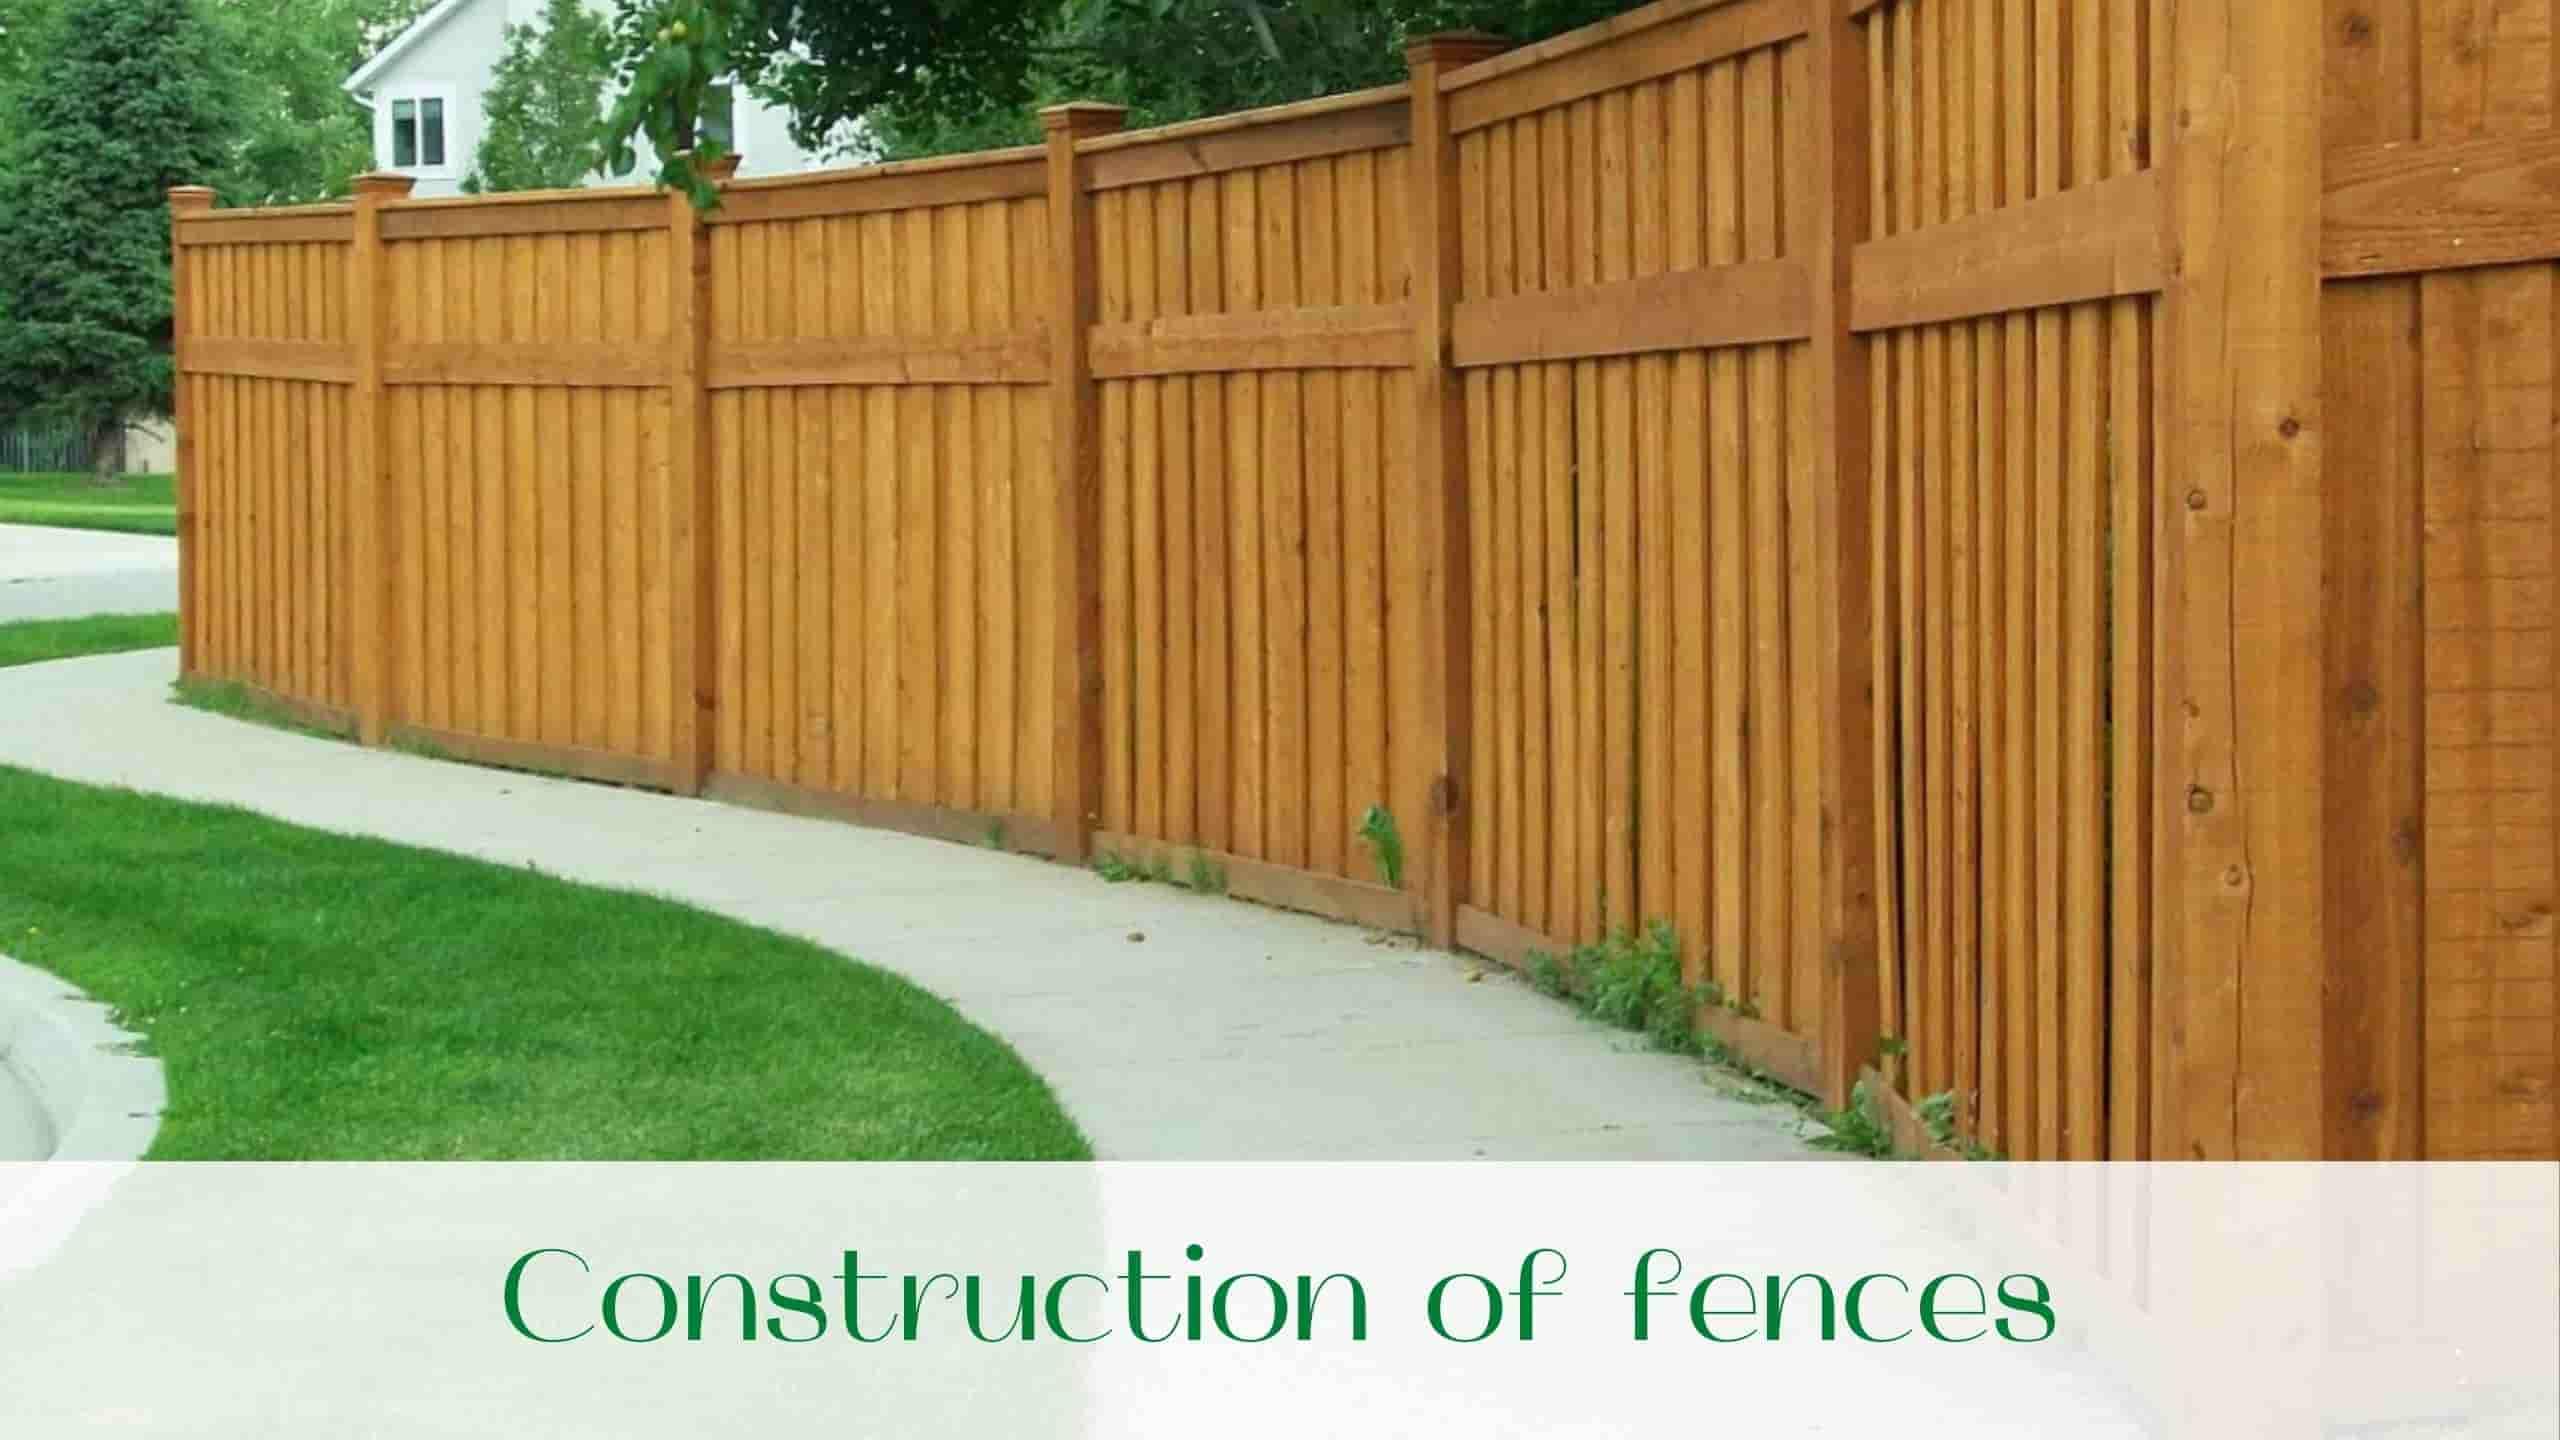 image-Construction-of-fences